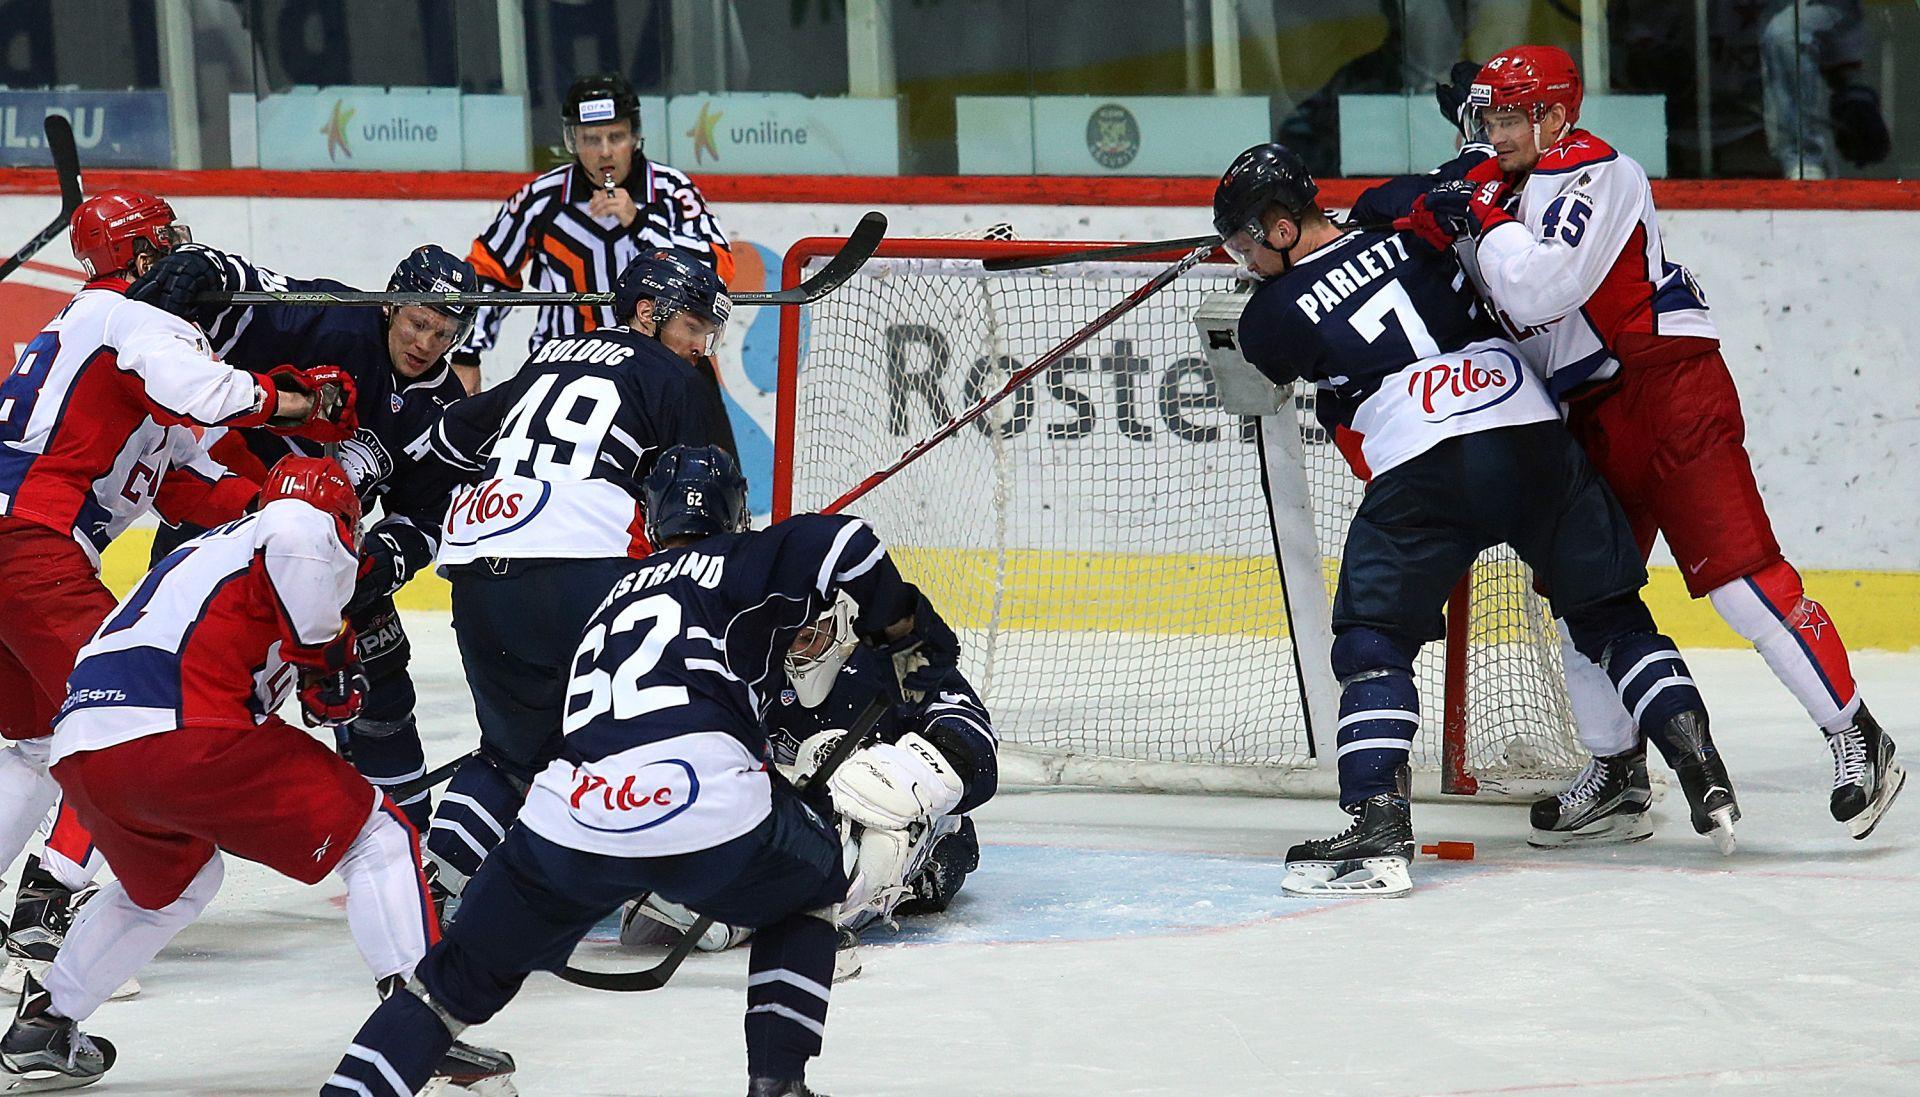 KHL Medveščak u Domu Sportova minimalno slavio protiv vodećeg CSKA Iz Moskve